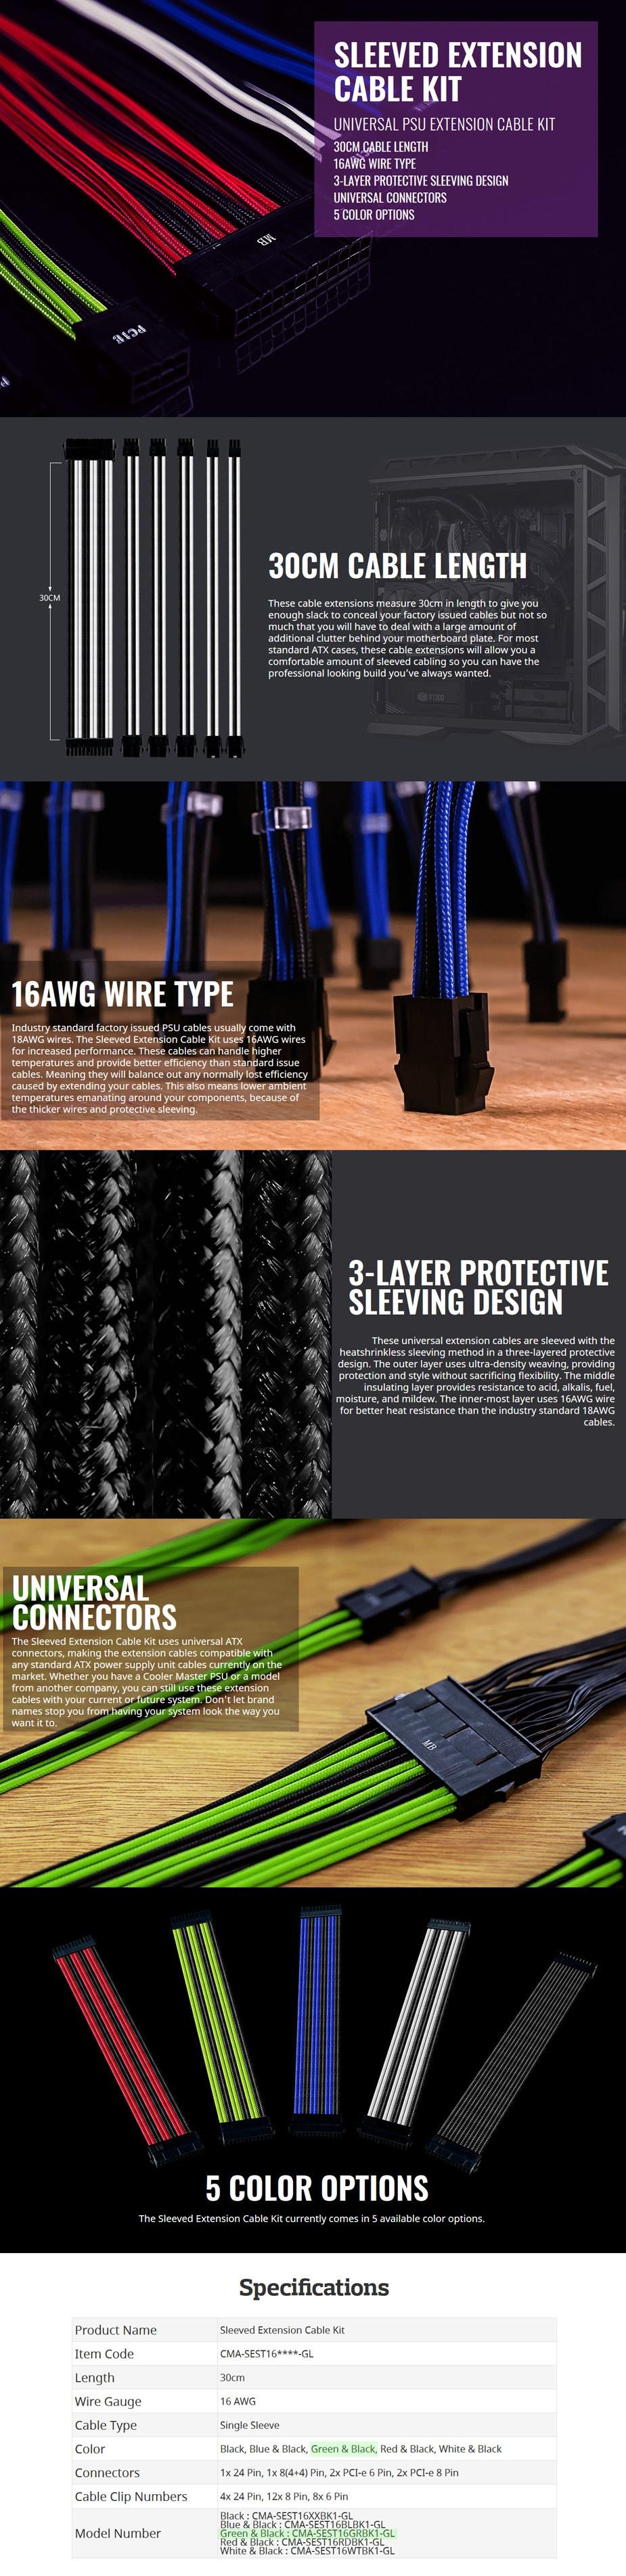 Cooler Master Universal PSU Sleeved Extension Cable Kit - Green/Black - Desktop Overview 1